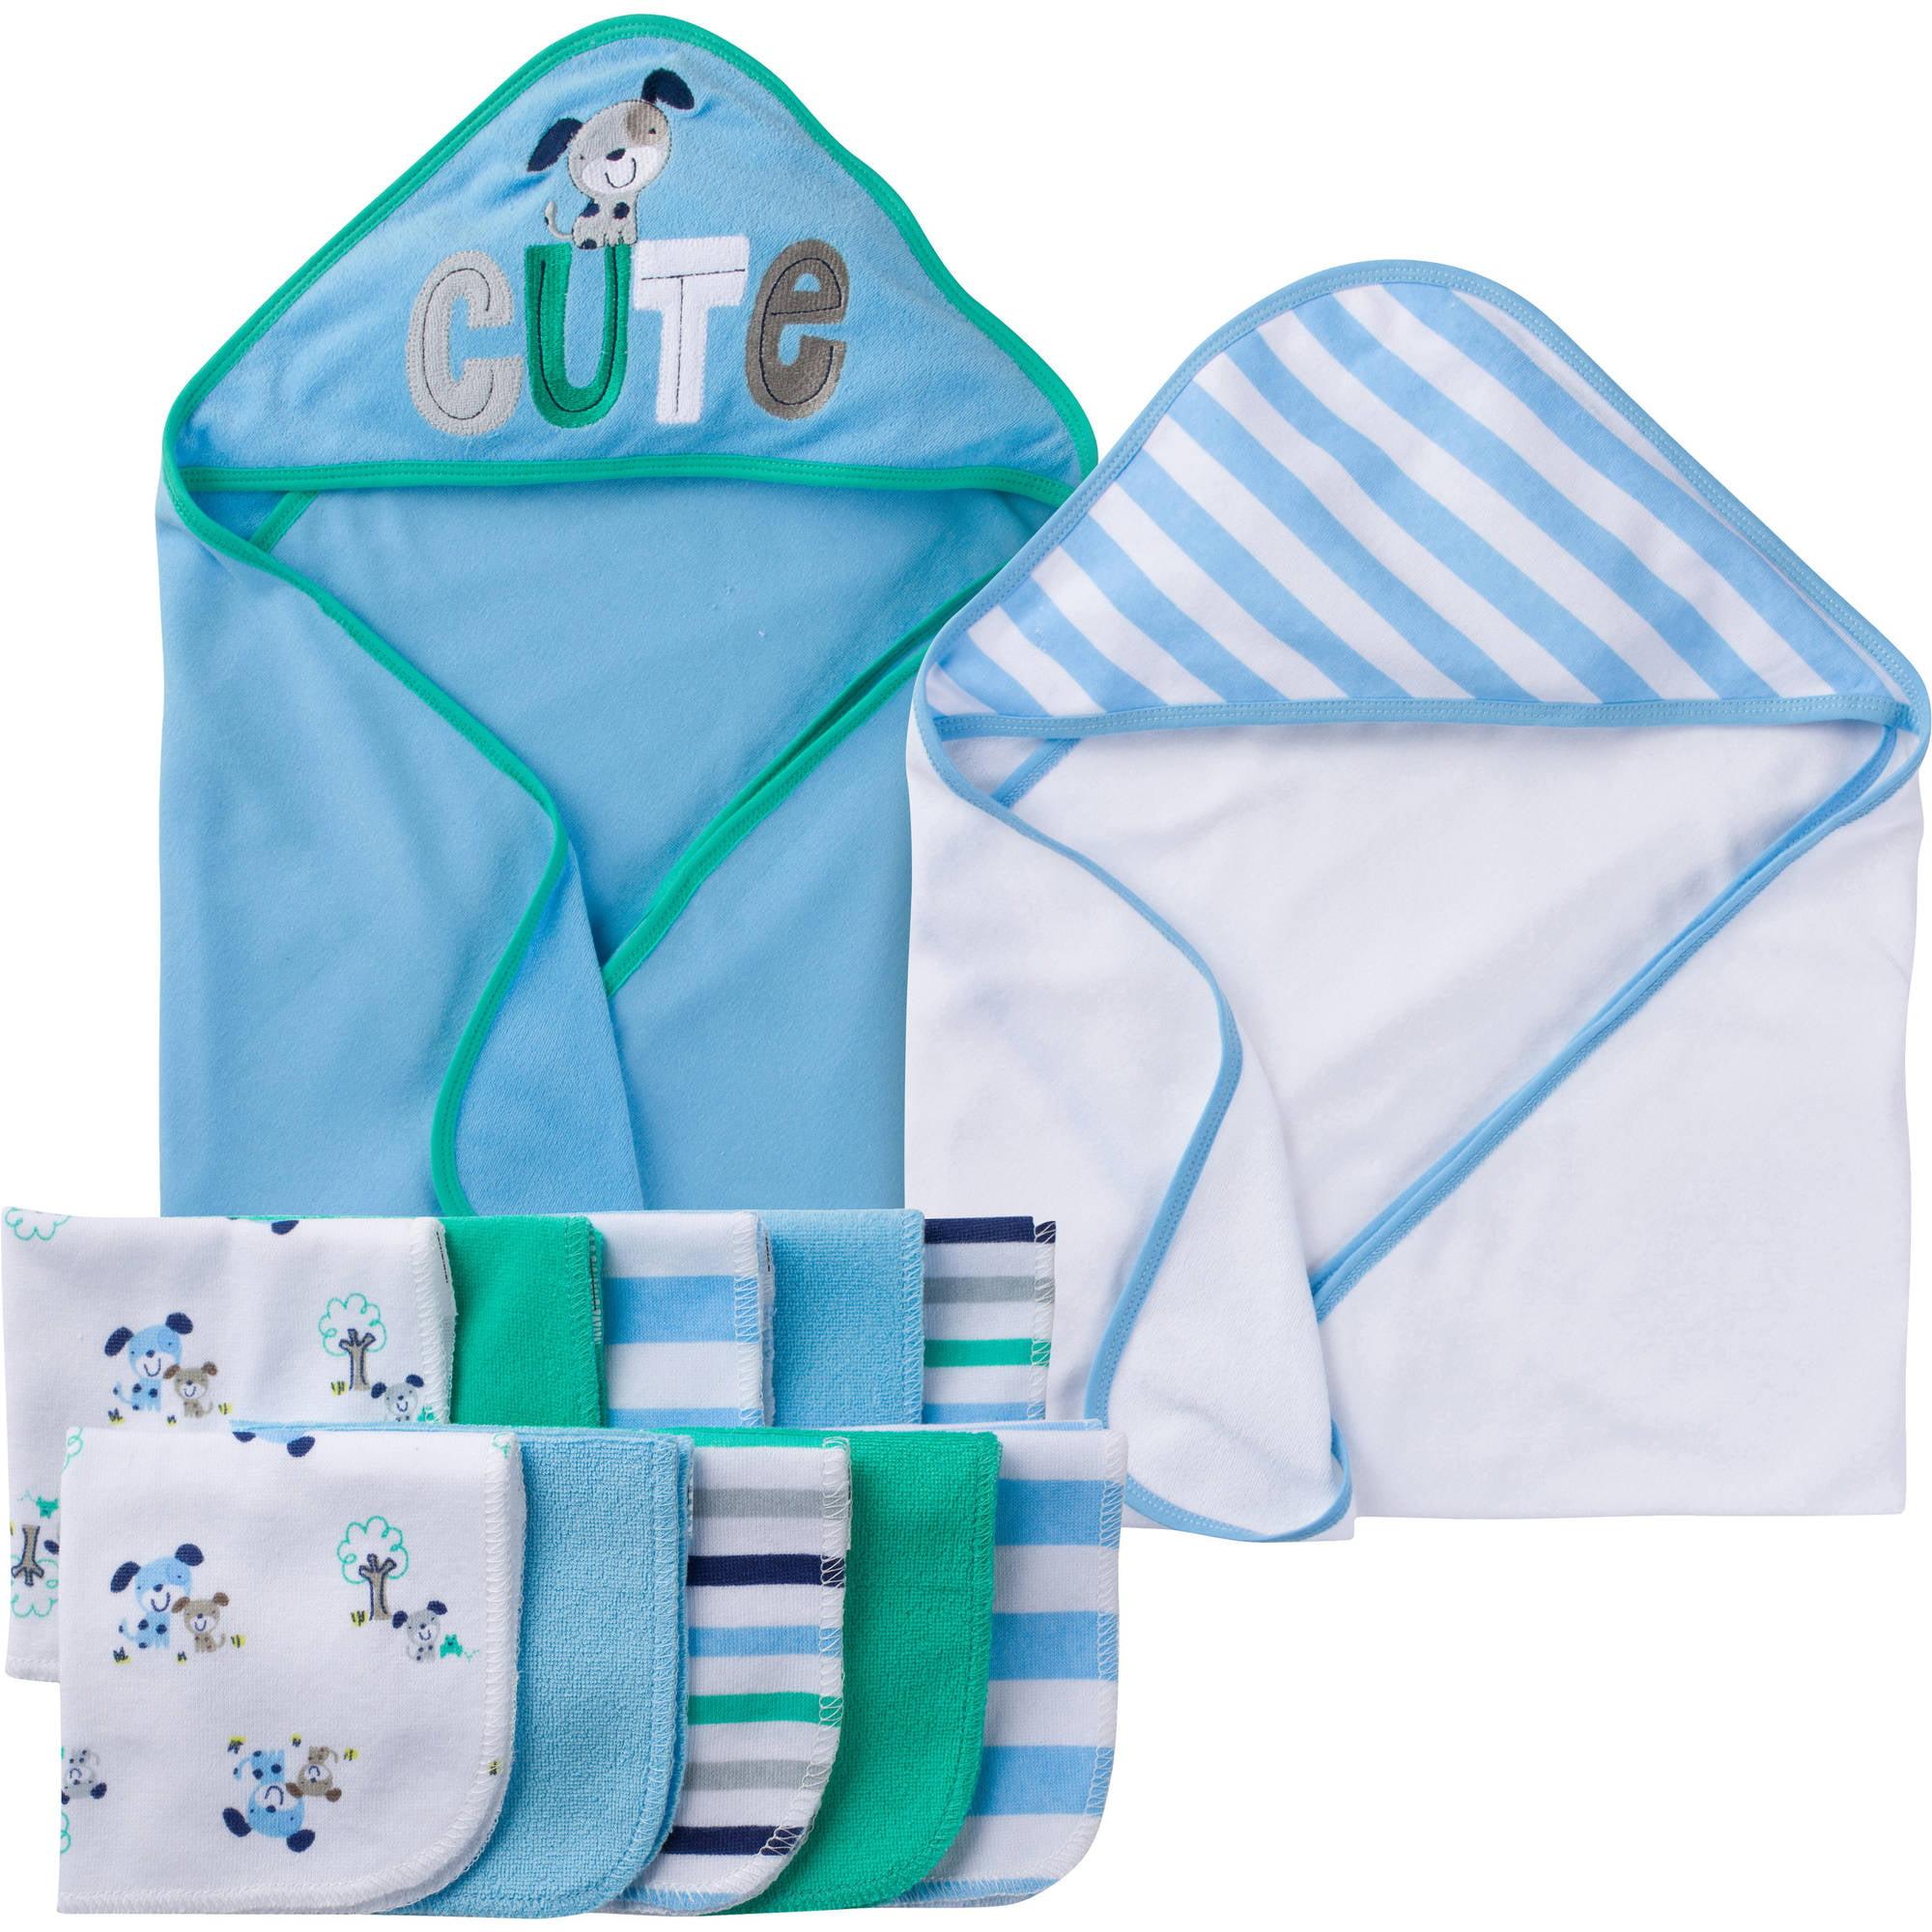 Gerber Newborn Baby Boy Towel and Washcloths Bath Gift Set, 12-Piece by Gerber